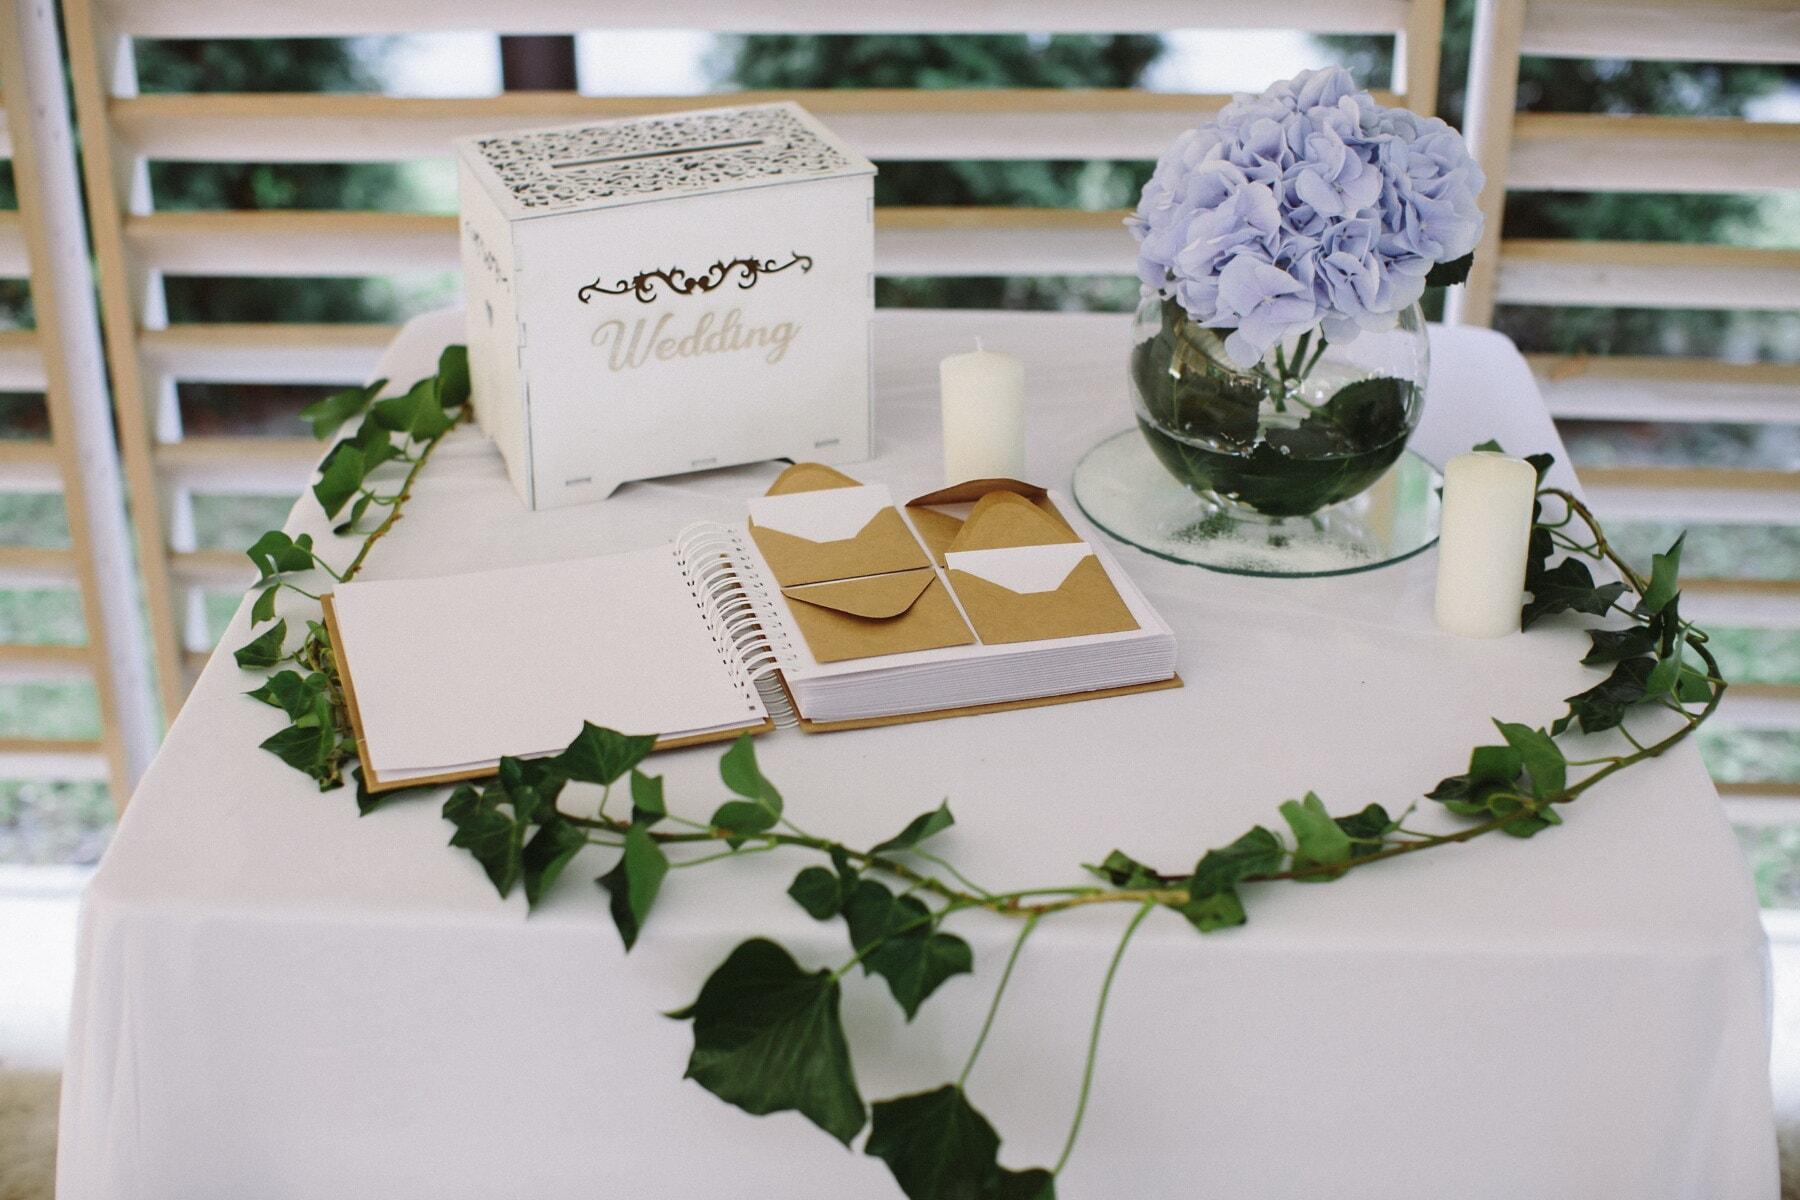 Hochzeit, Buch, gebundene Ausgabe, Interieur-design, Still-Leben, Blatt, Blume, Natur, Papier, Kerze